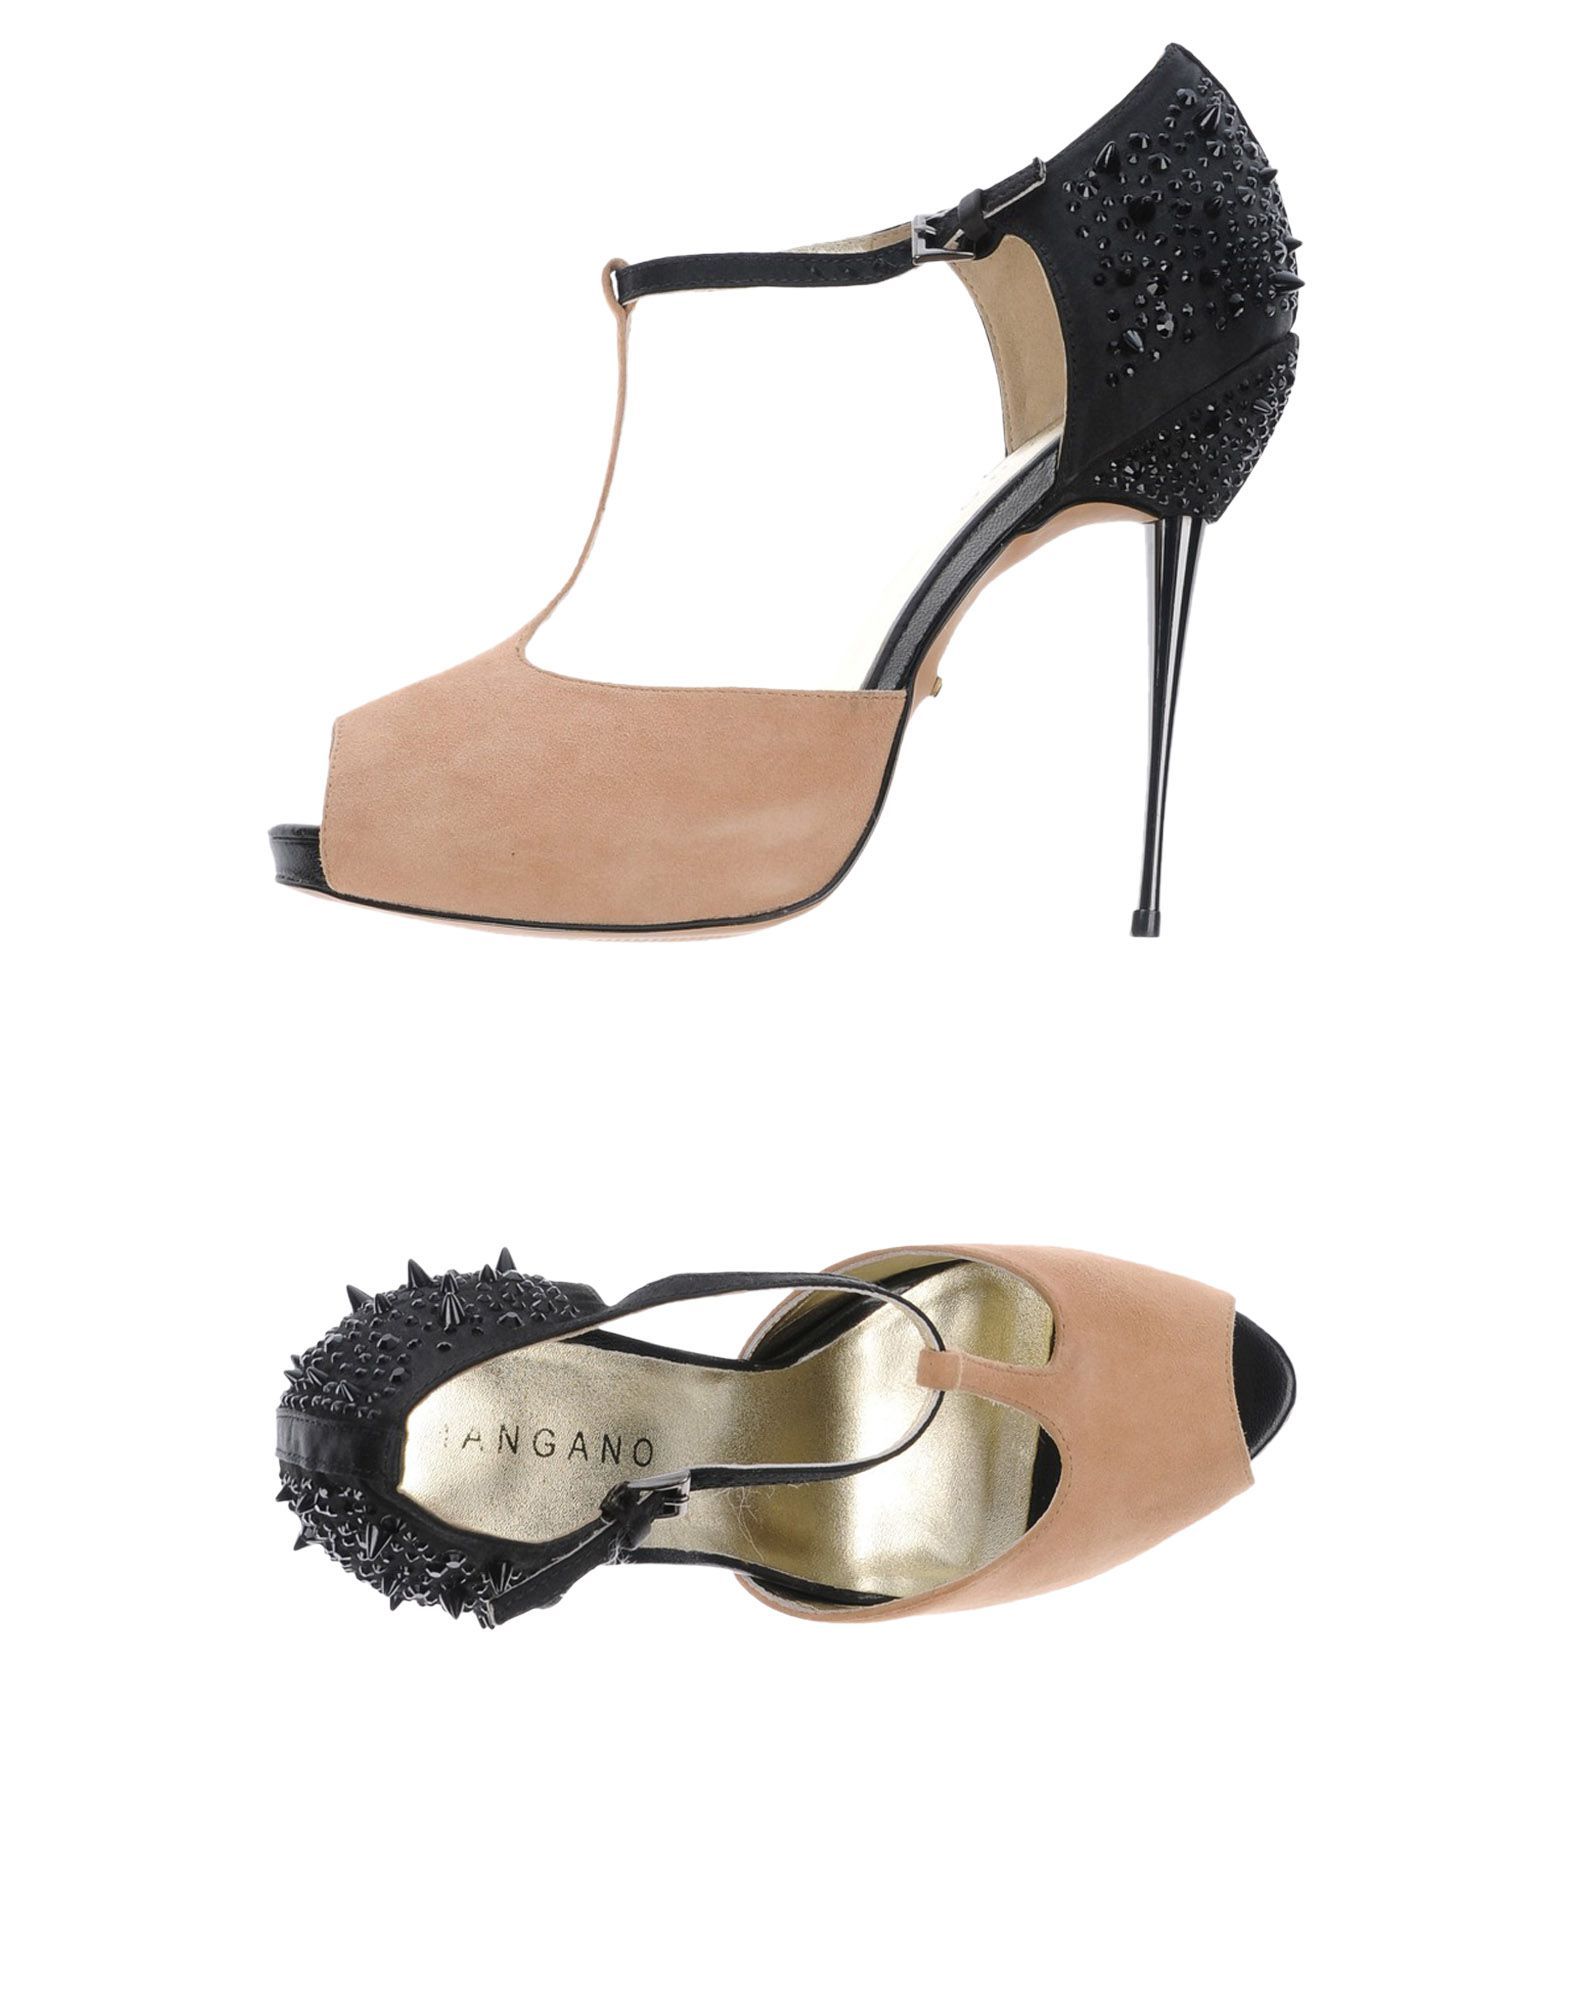 Mangano Sandalen Damen  beliebte 11452225IC Gute Qualität beliebte  Schuhe bd2413